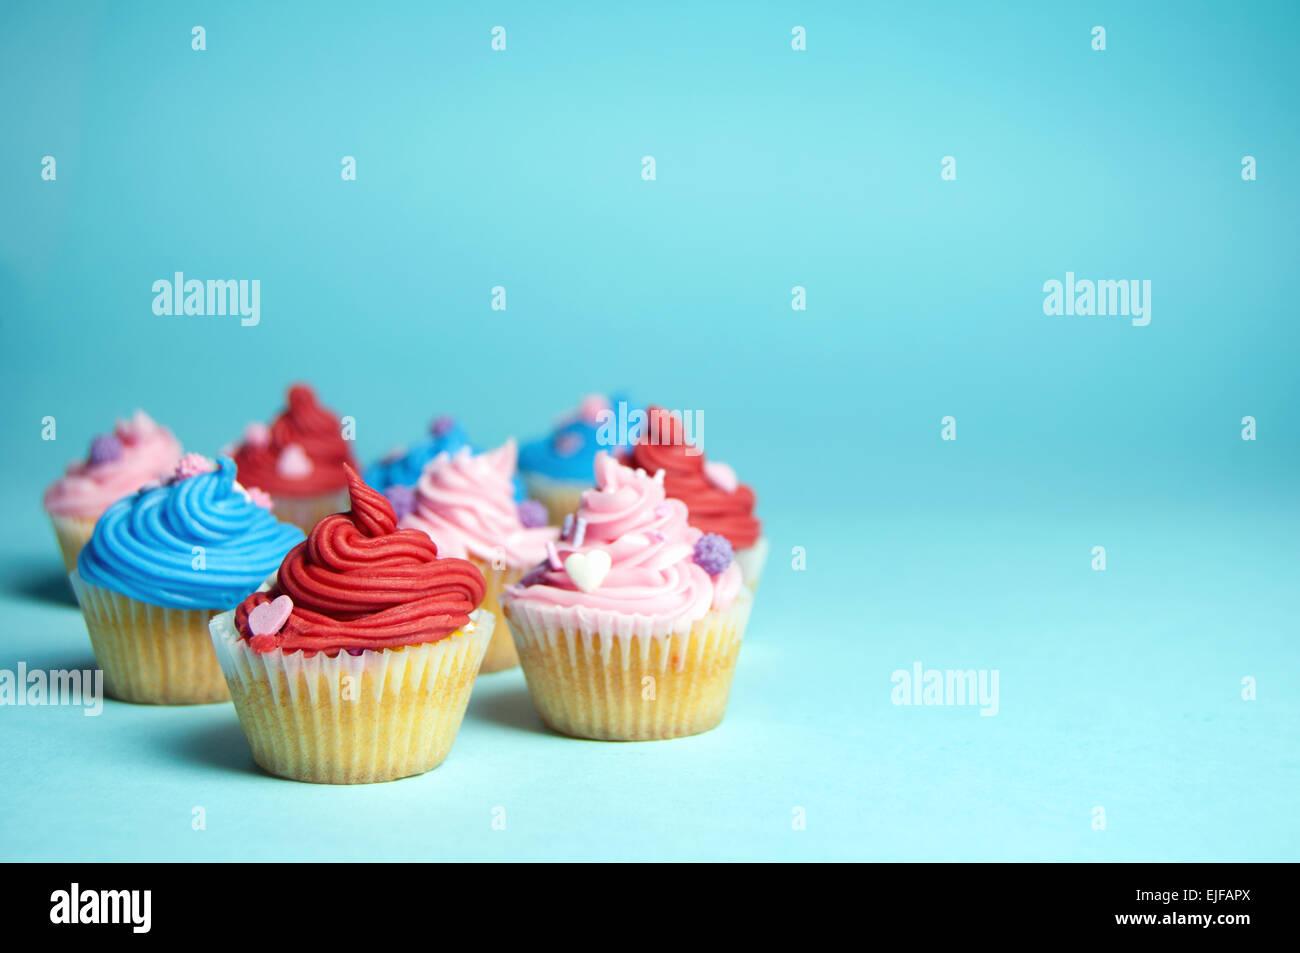 Crema assortiti tortine con copyspace Immagini Stock